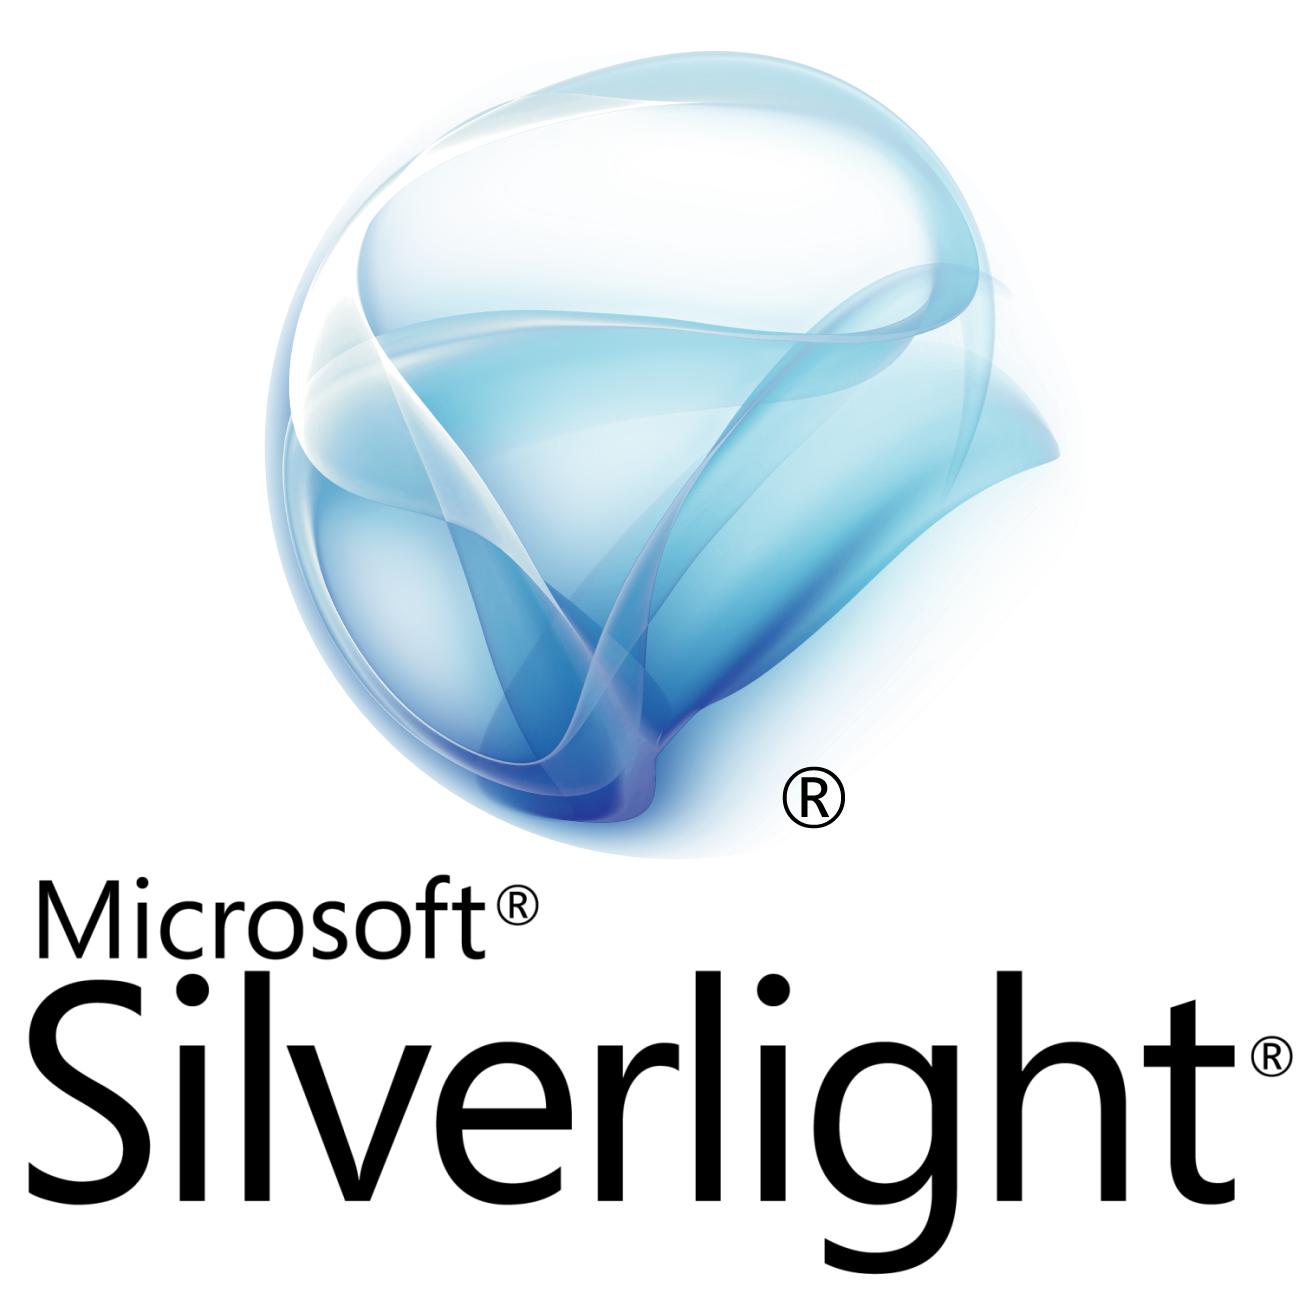 266microsoft_silverlight_